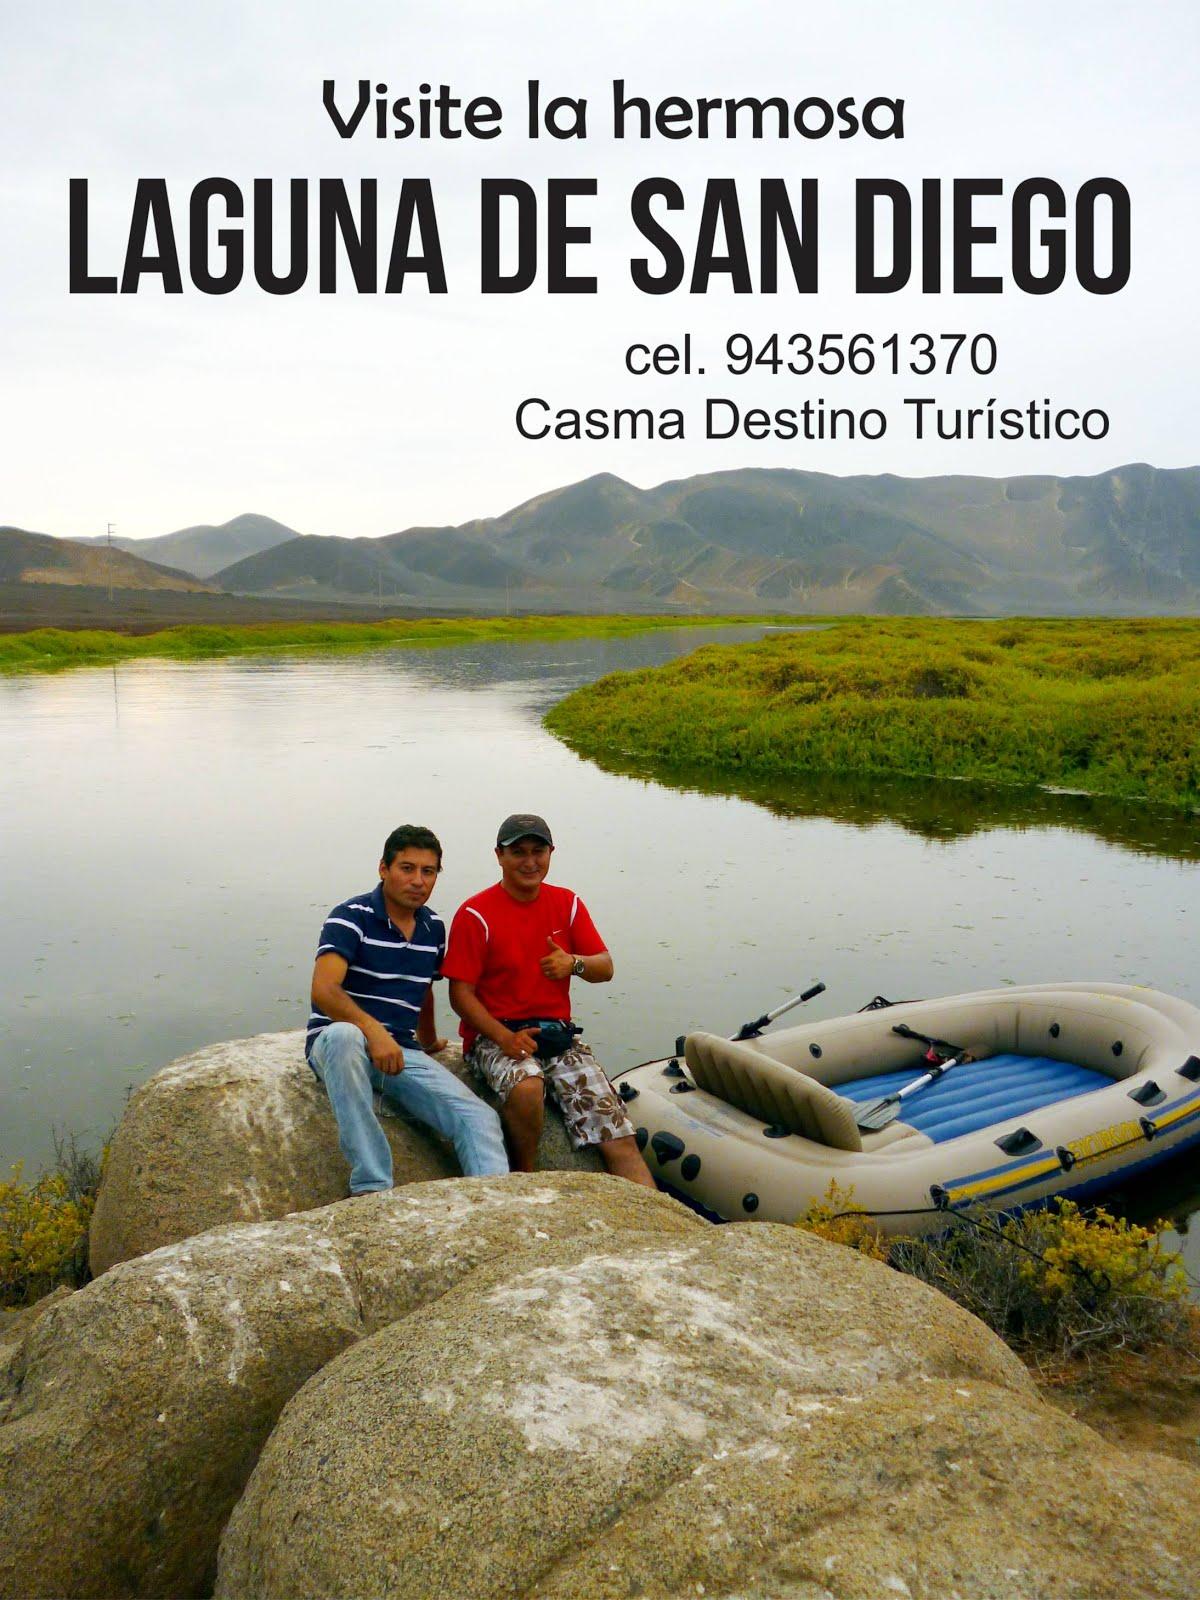 Laguna de San Diego - Casma